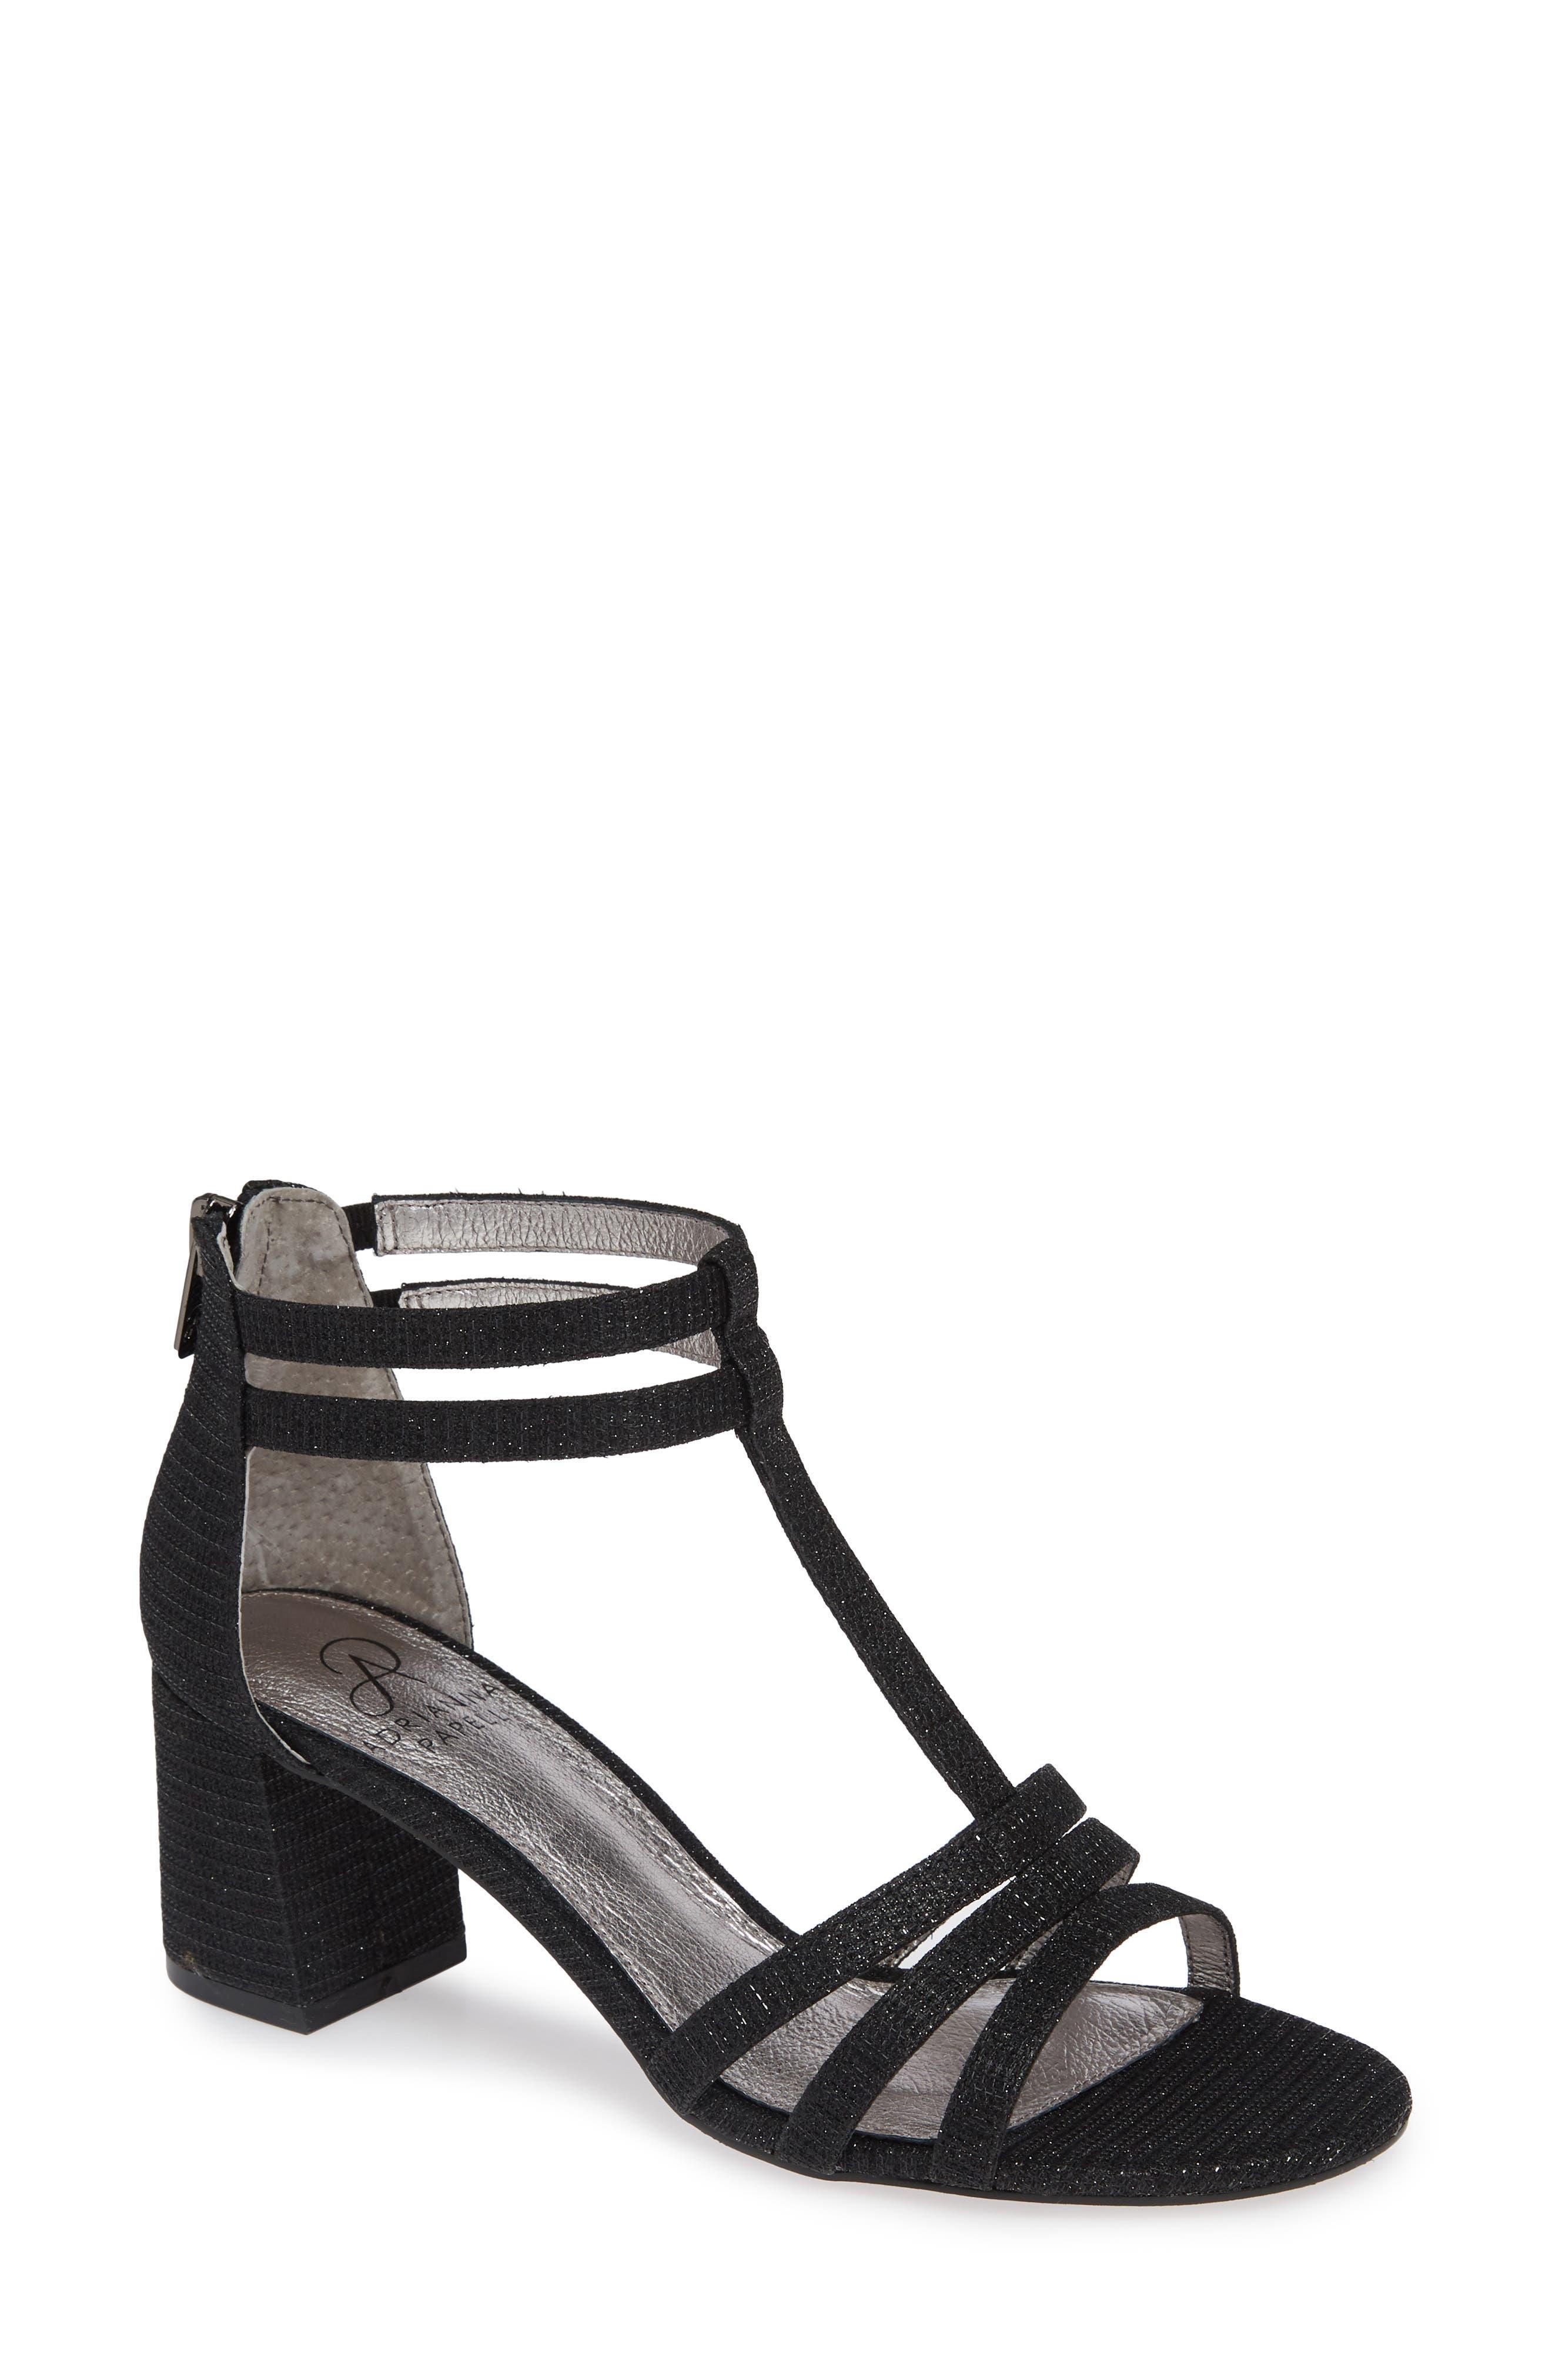 Anella Block Heel Sandal,                         Main,                         color, BLACK GLITTER